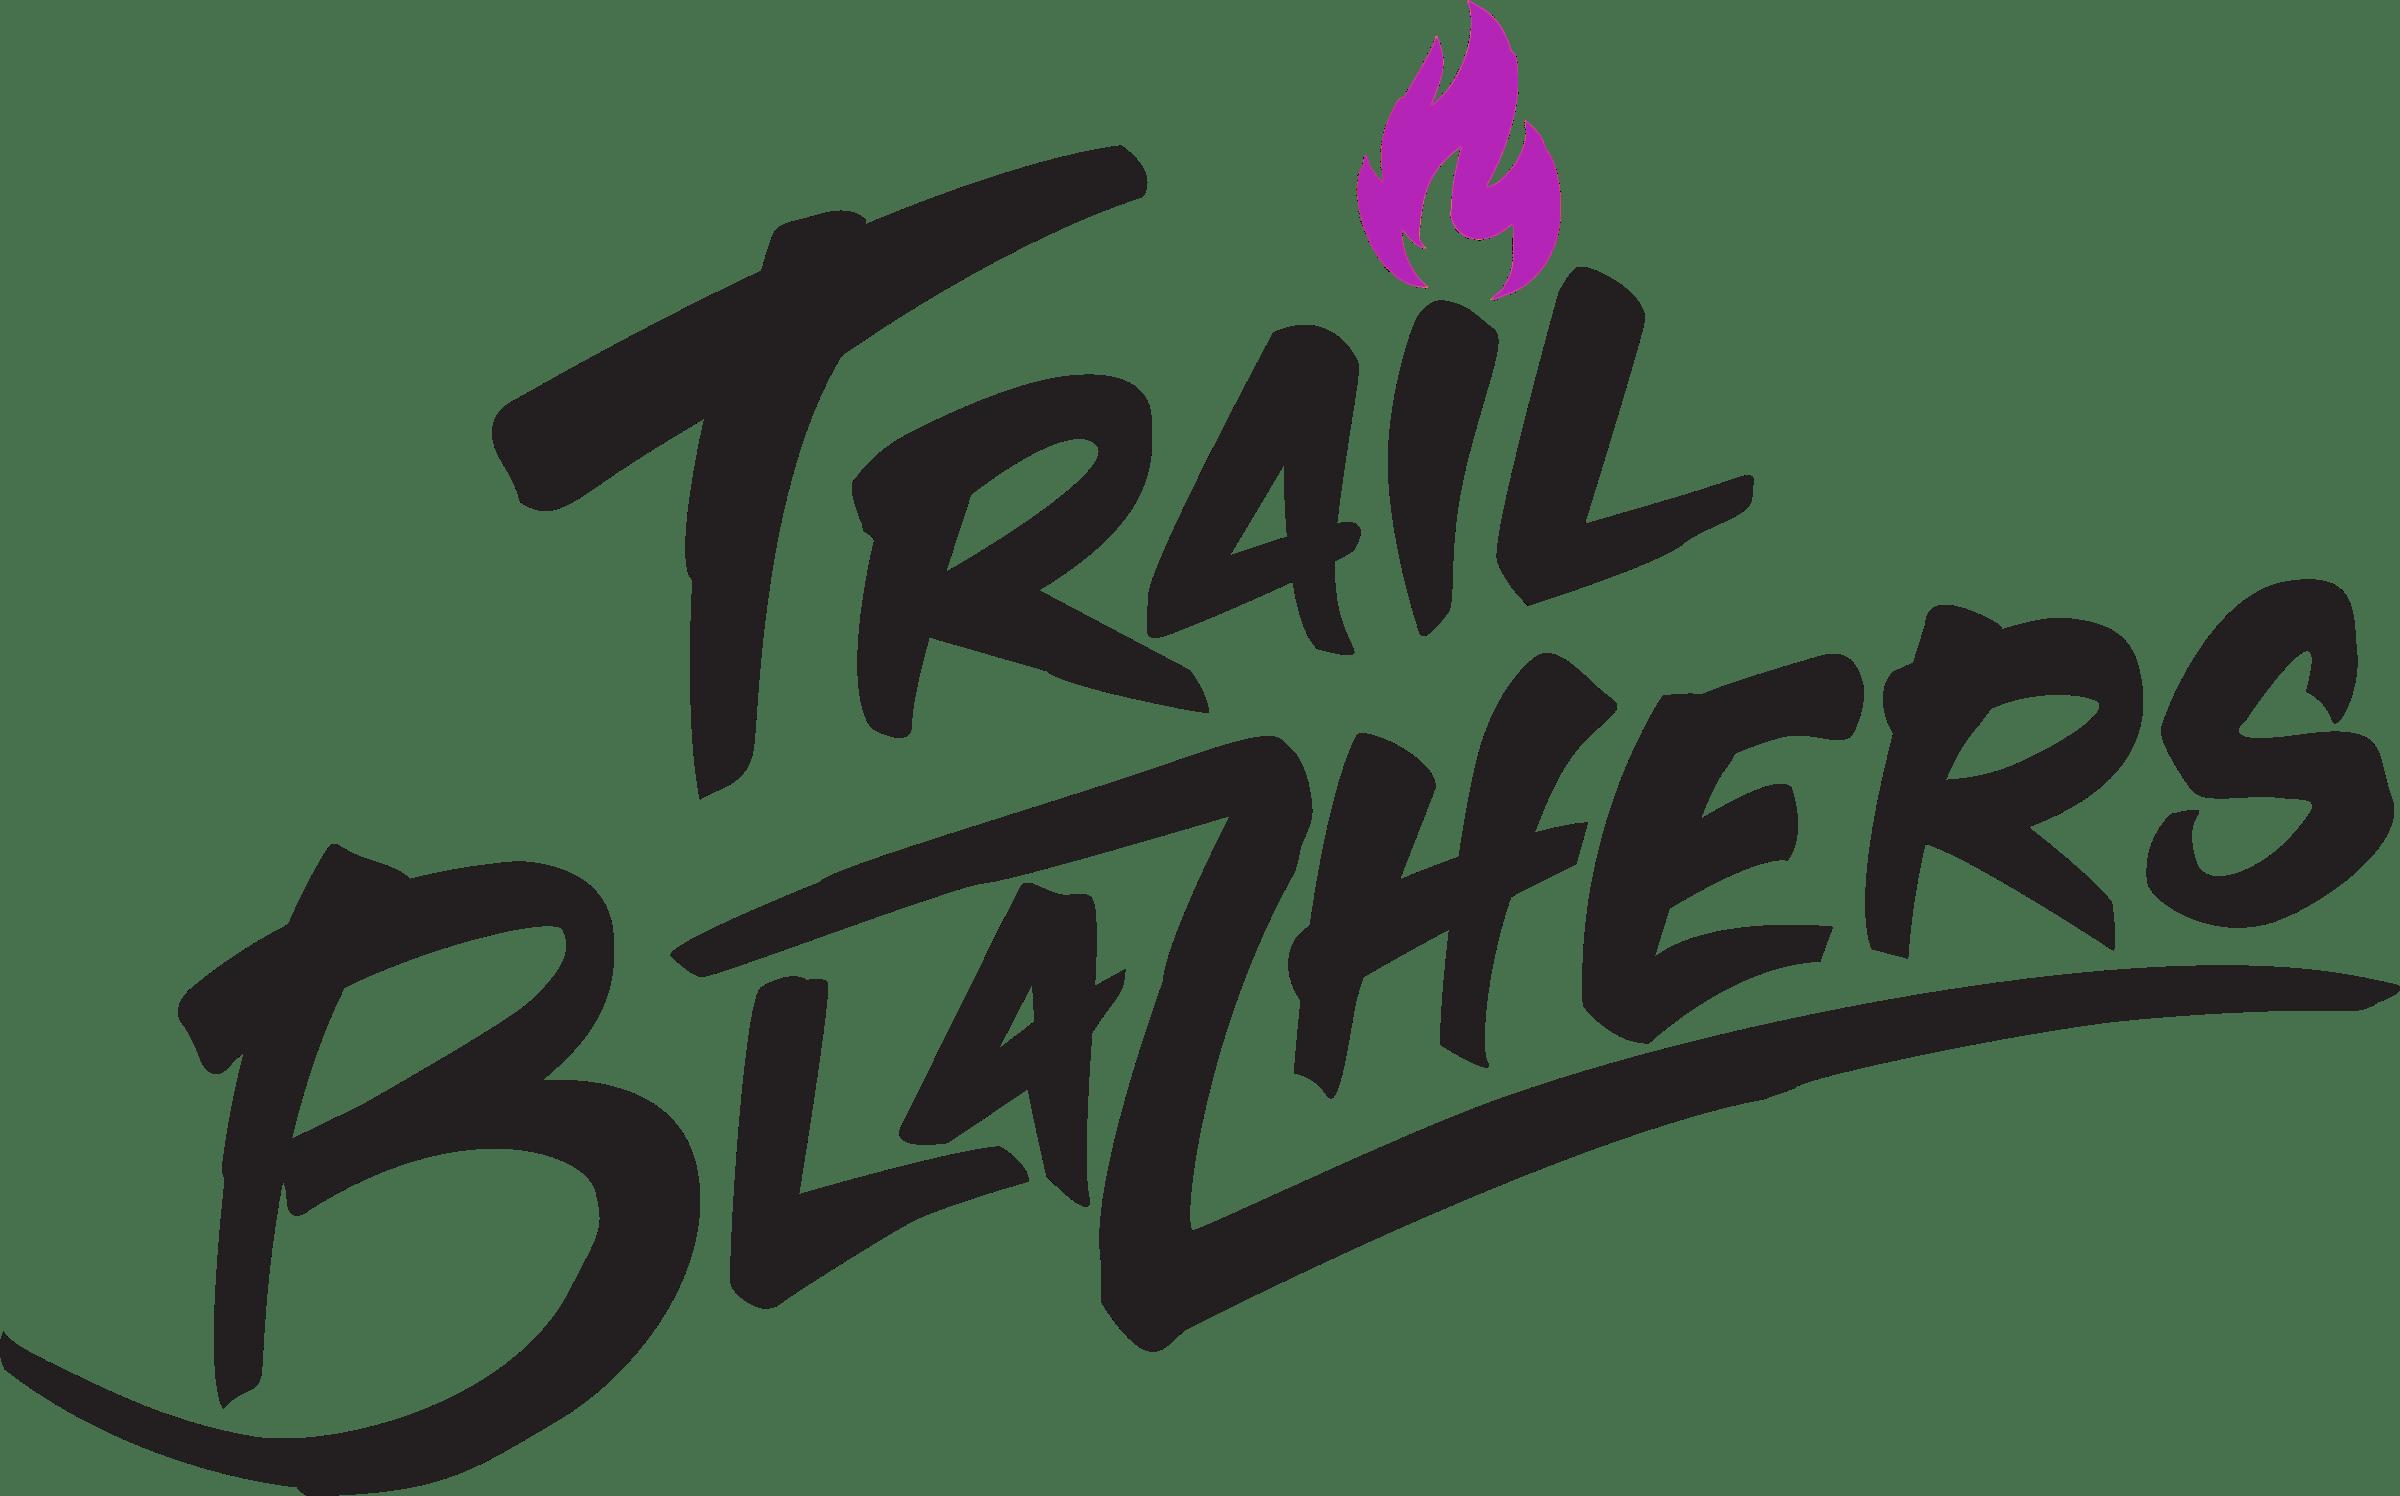 TrailblazHers Run Co